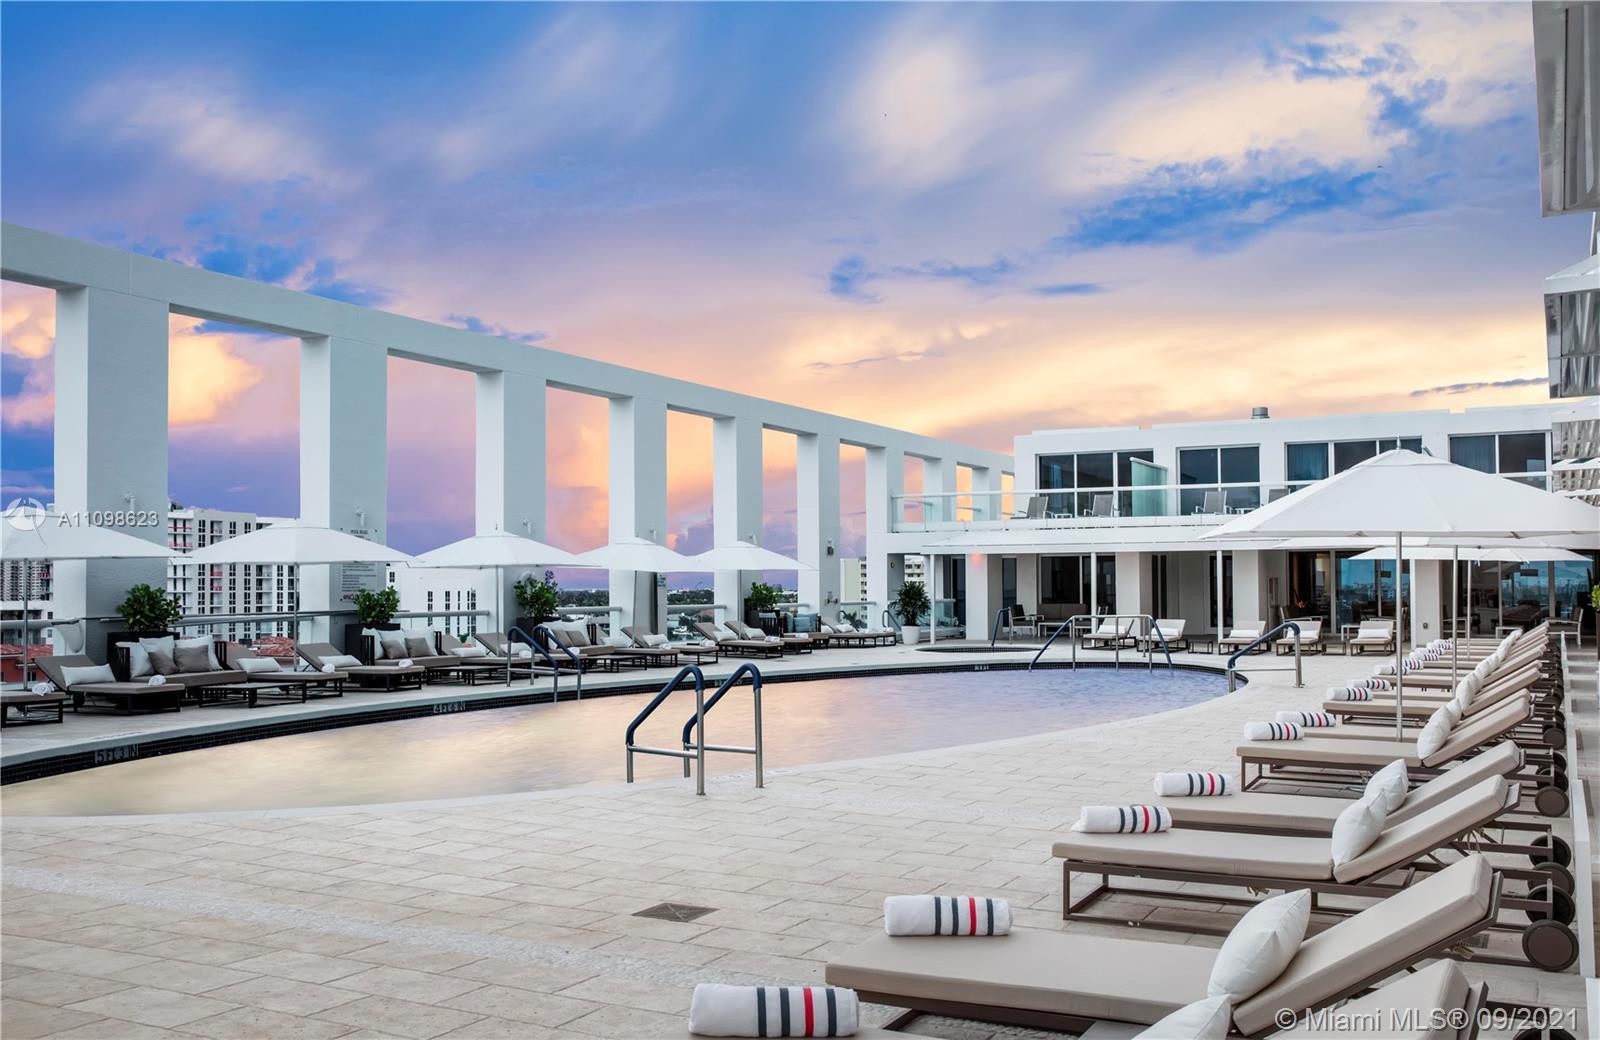 551 N Fort Lauderdale Beach Blvd #8